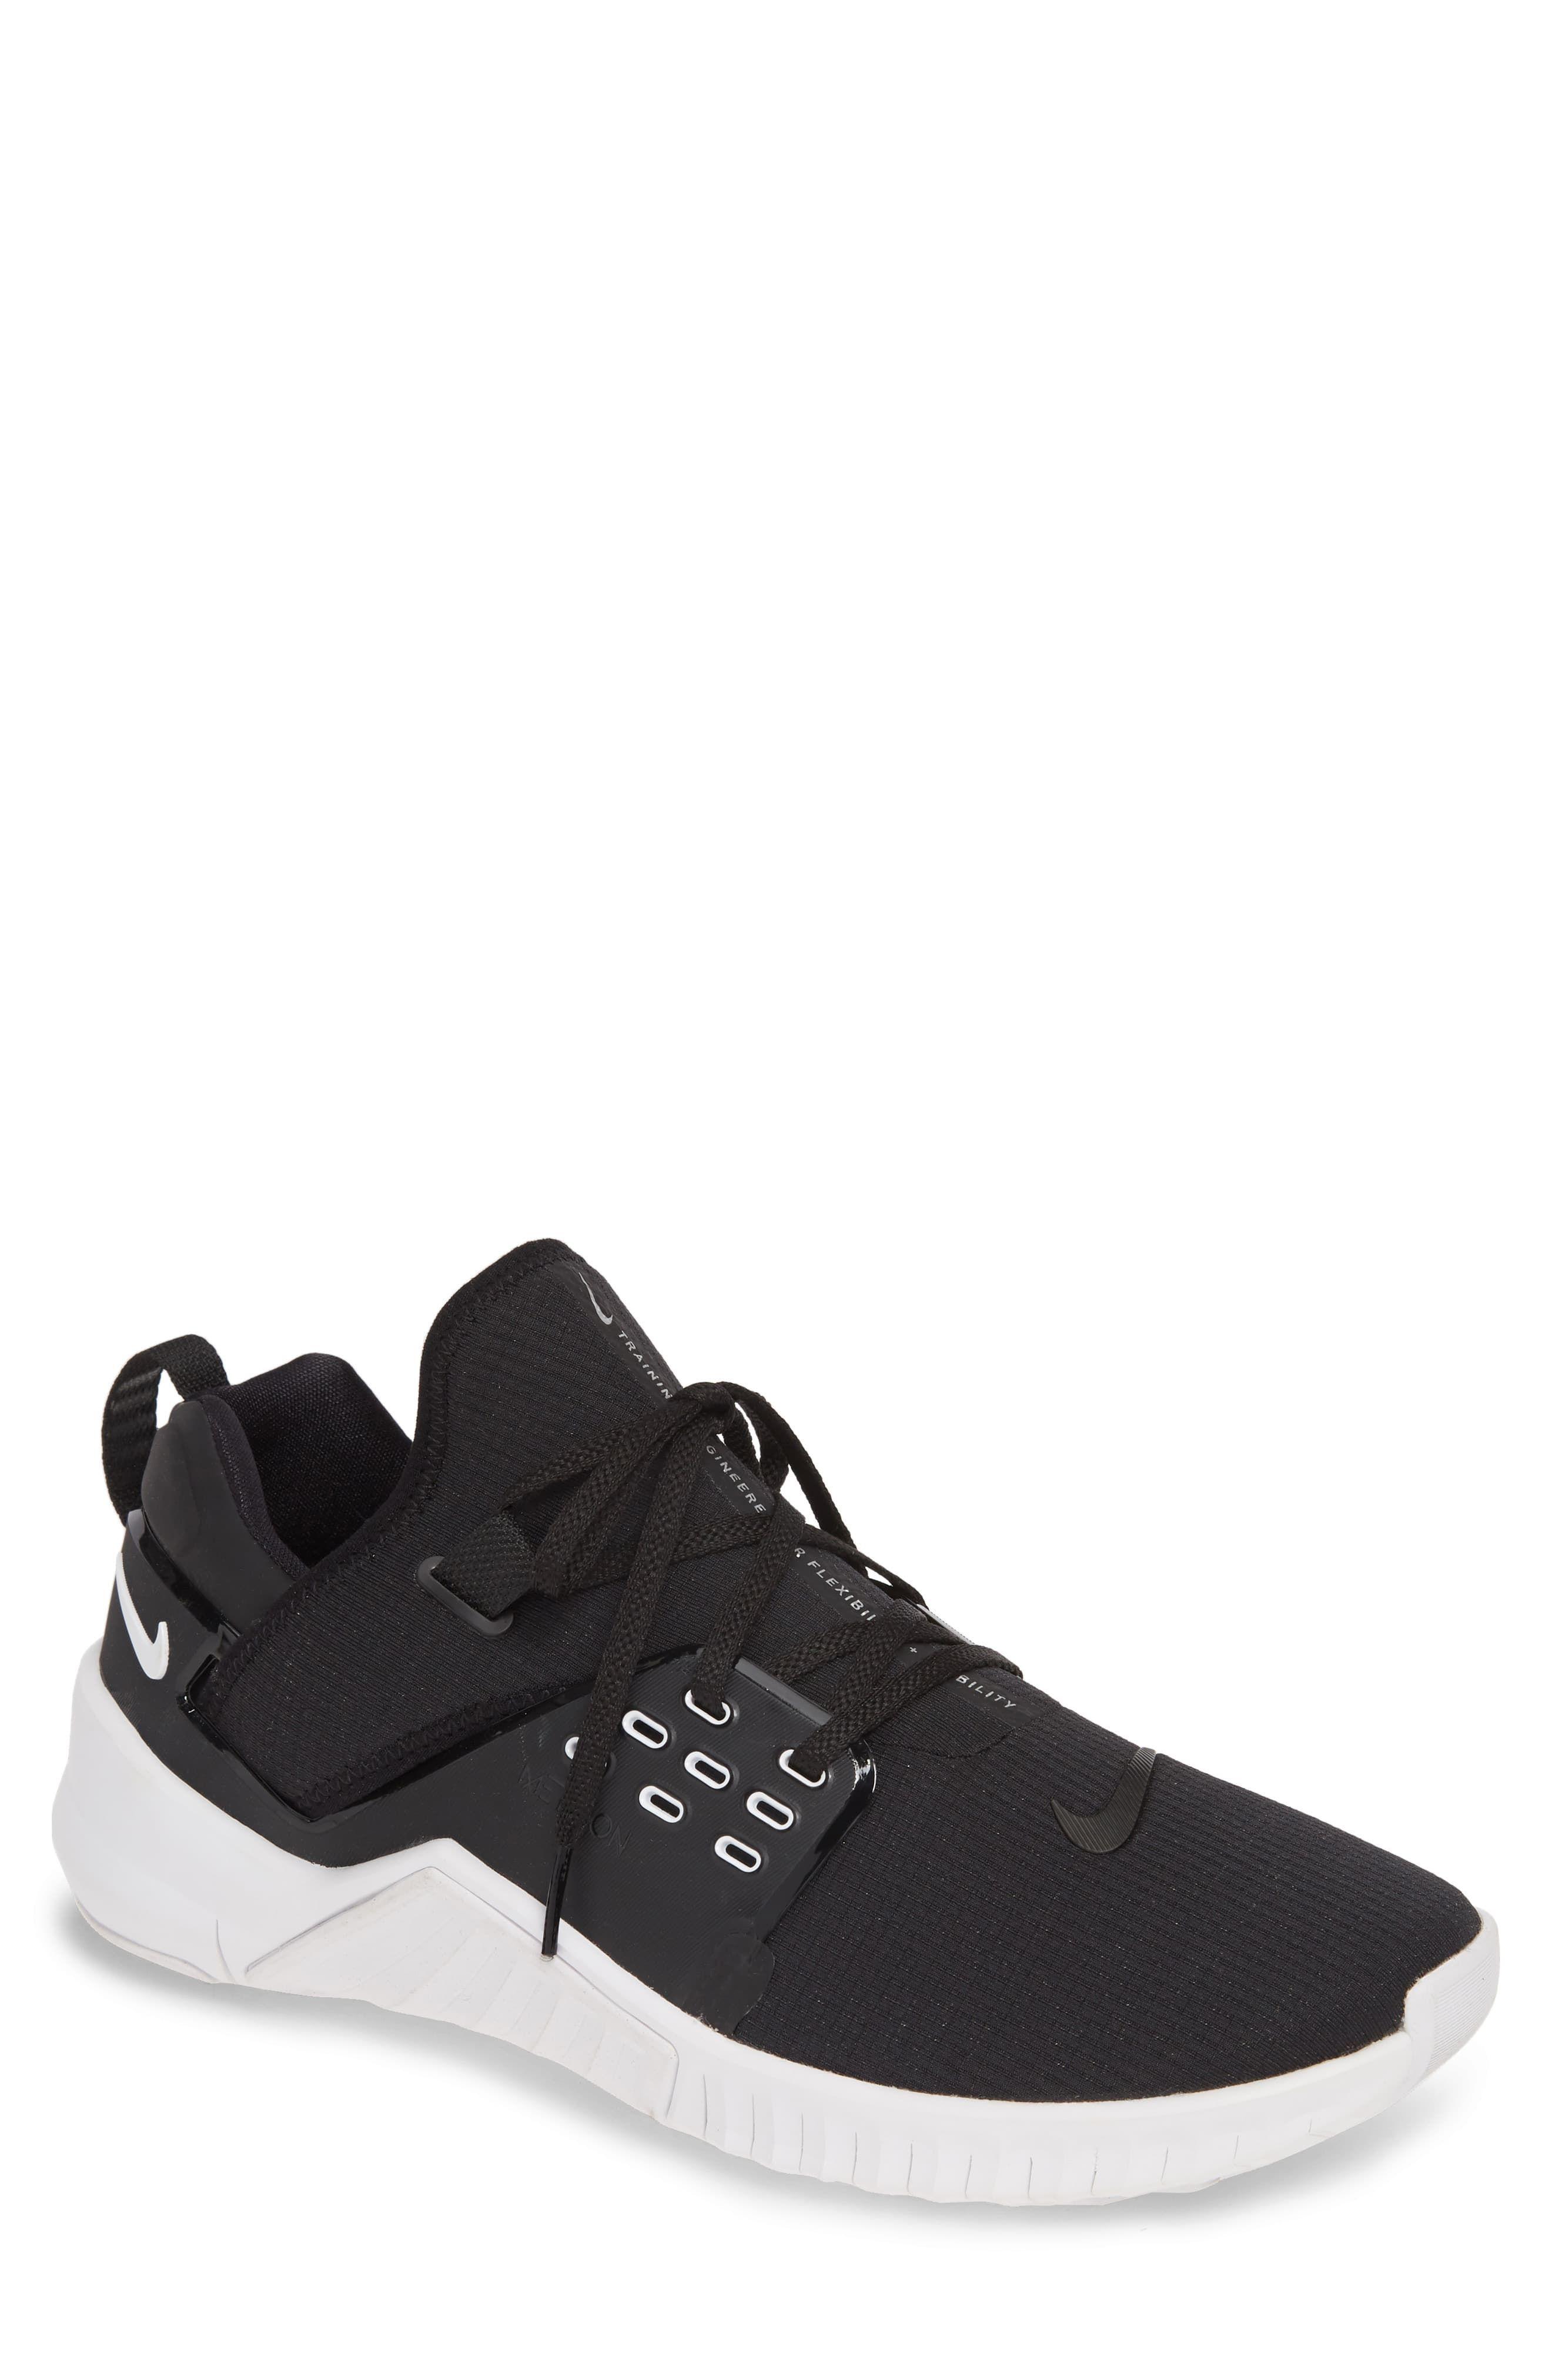 Mens training shoes, Nike men